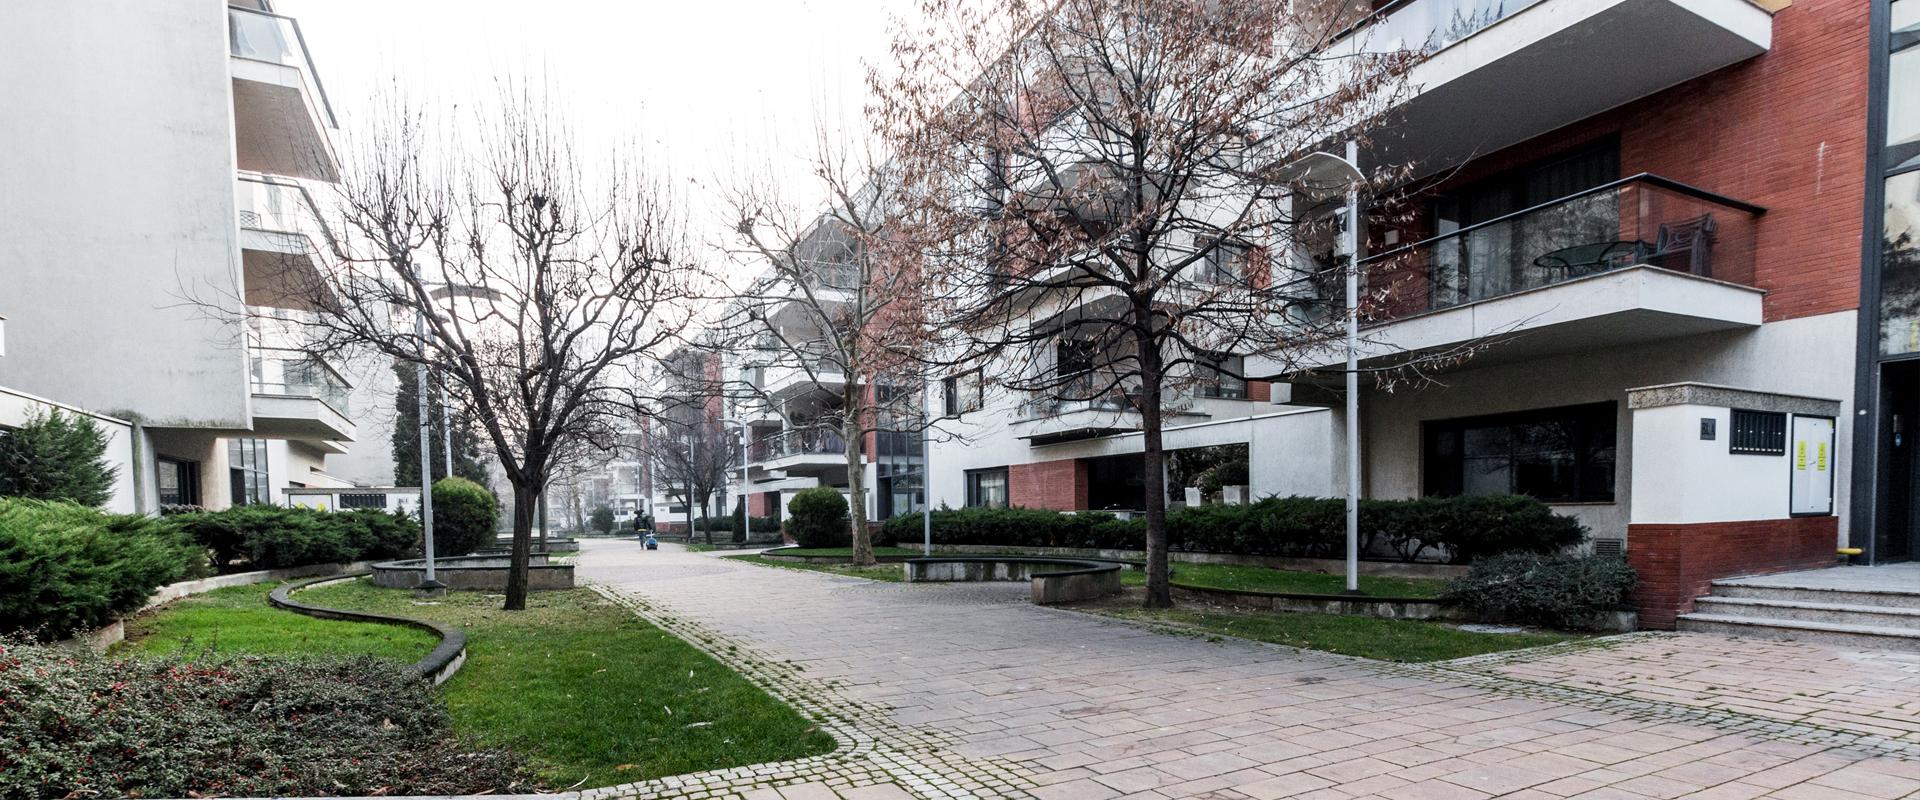 Inchiriere apartament 4 camere Premium, Renovat 2020 – Washington Residence! [ID: CP867481 ]